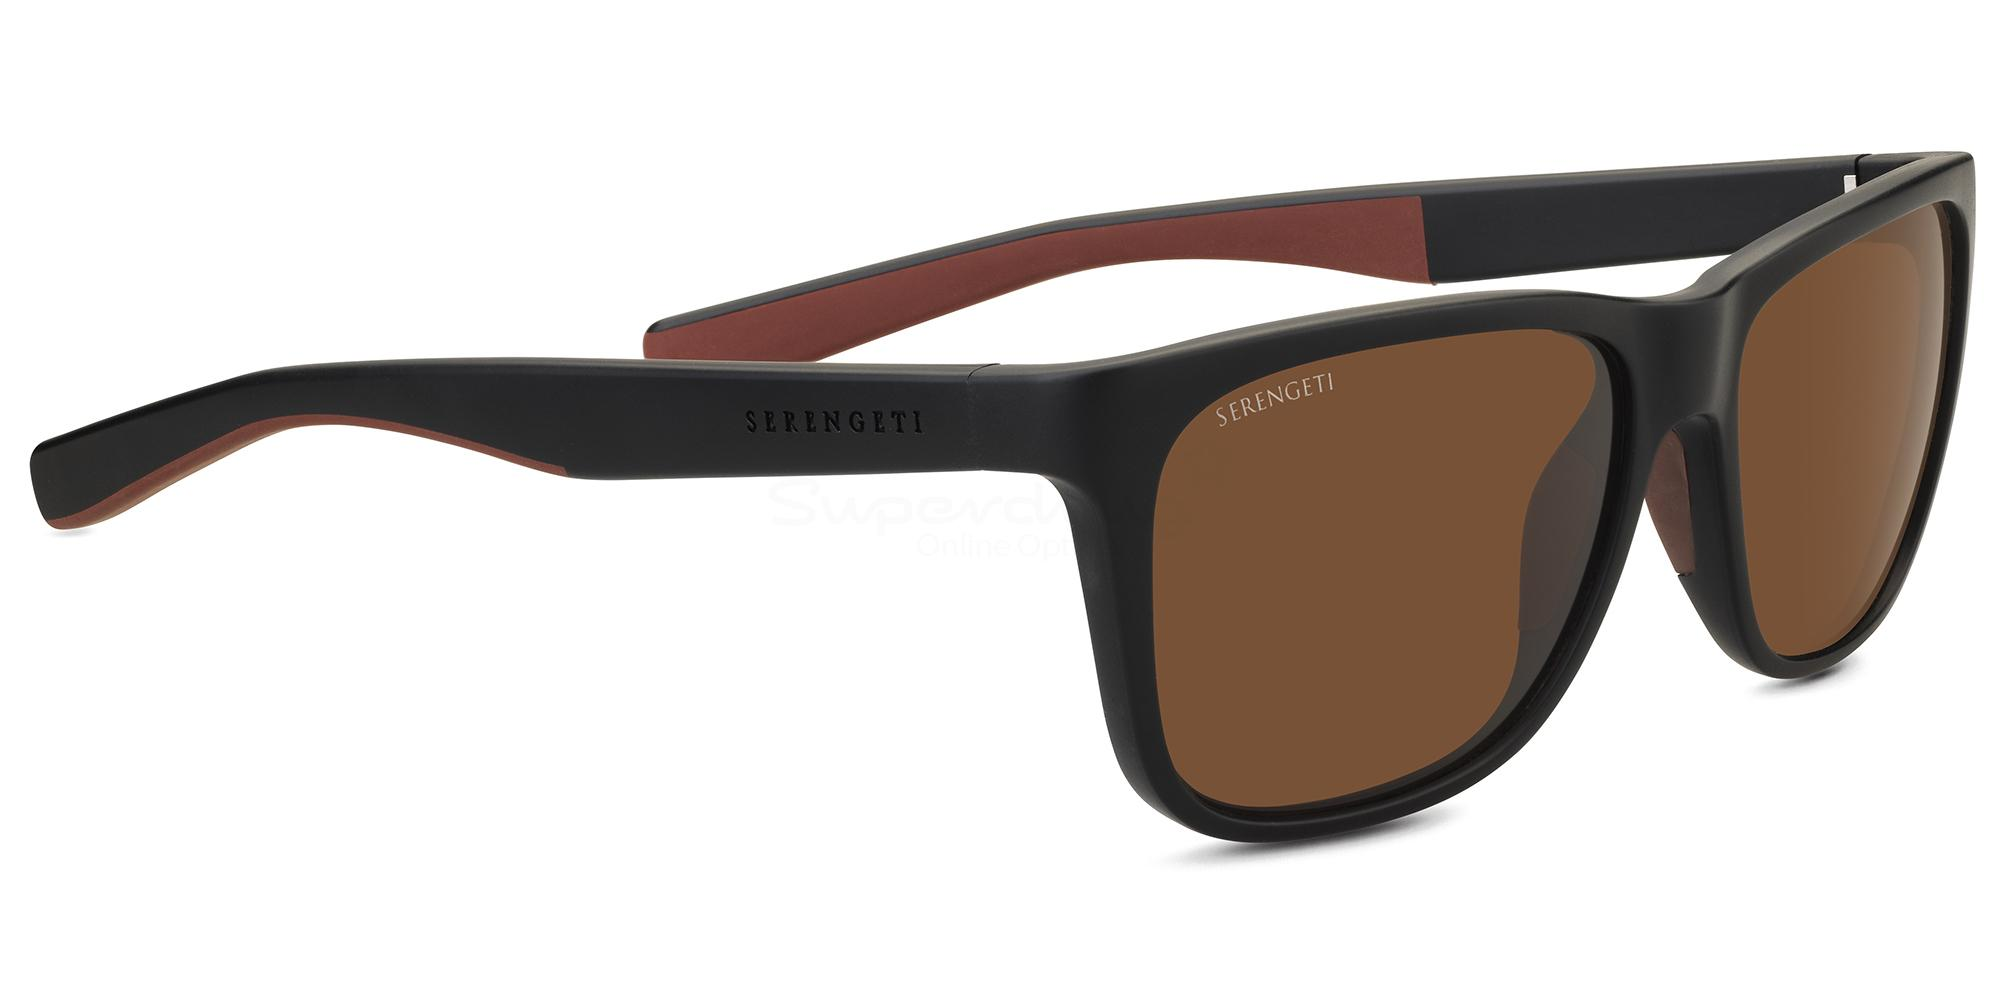 8681 LIVIO Sunglasses, Serengeti